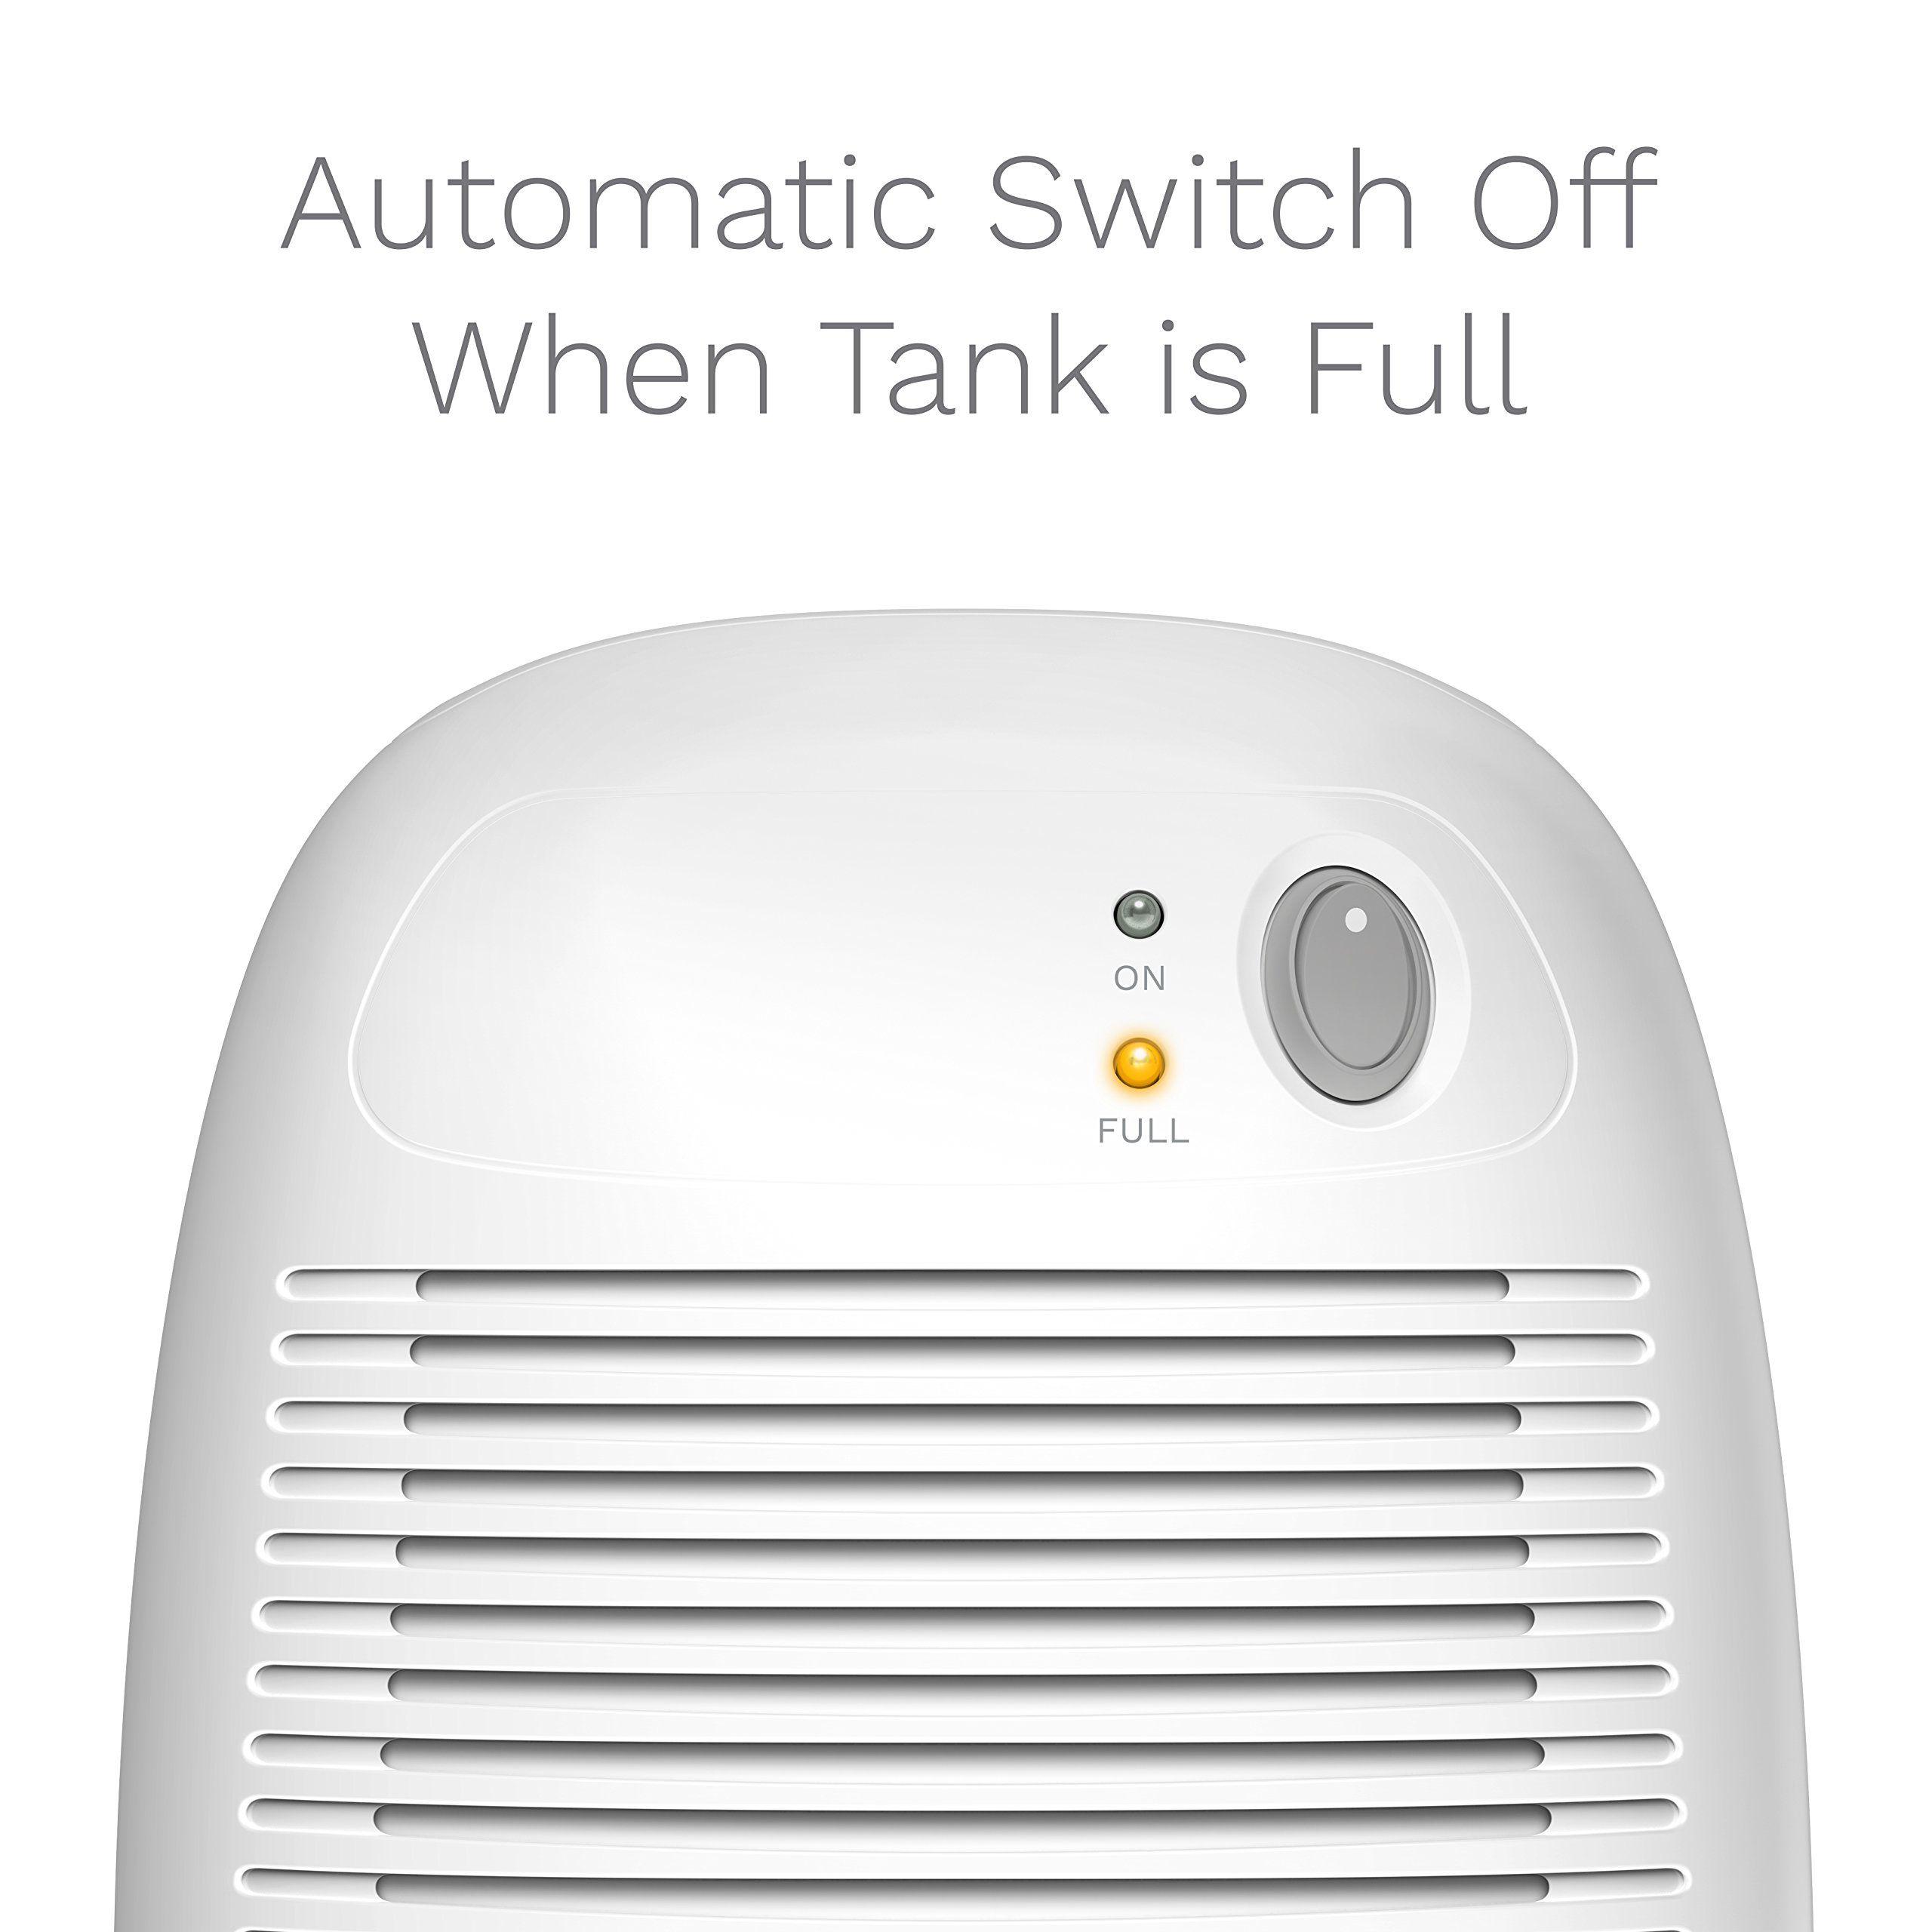 Home Small Dehumidifier For 1200 Cu Ft 150 Sq Ft Bathroom Or Closet 16 Oz Capacity Mini Quiet Safe Compact The Dehumidifiers Mold And Mildew Mini Dehumidifier